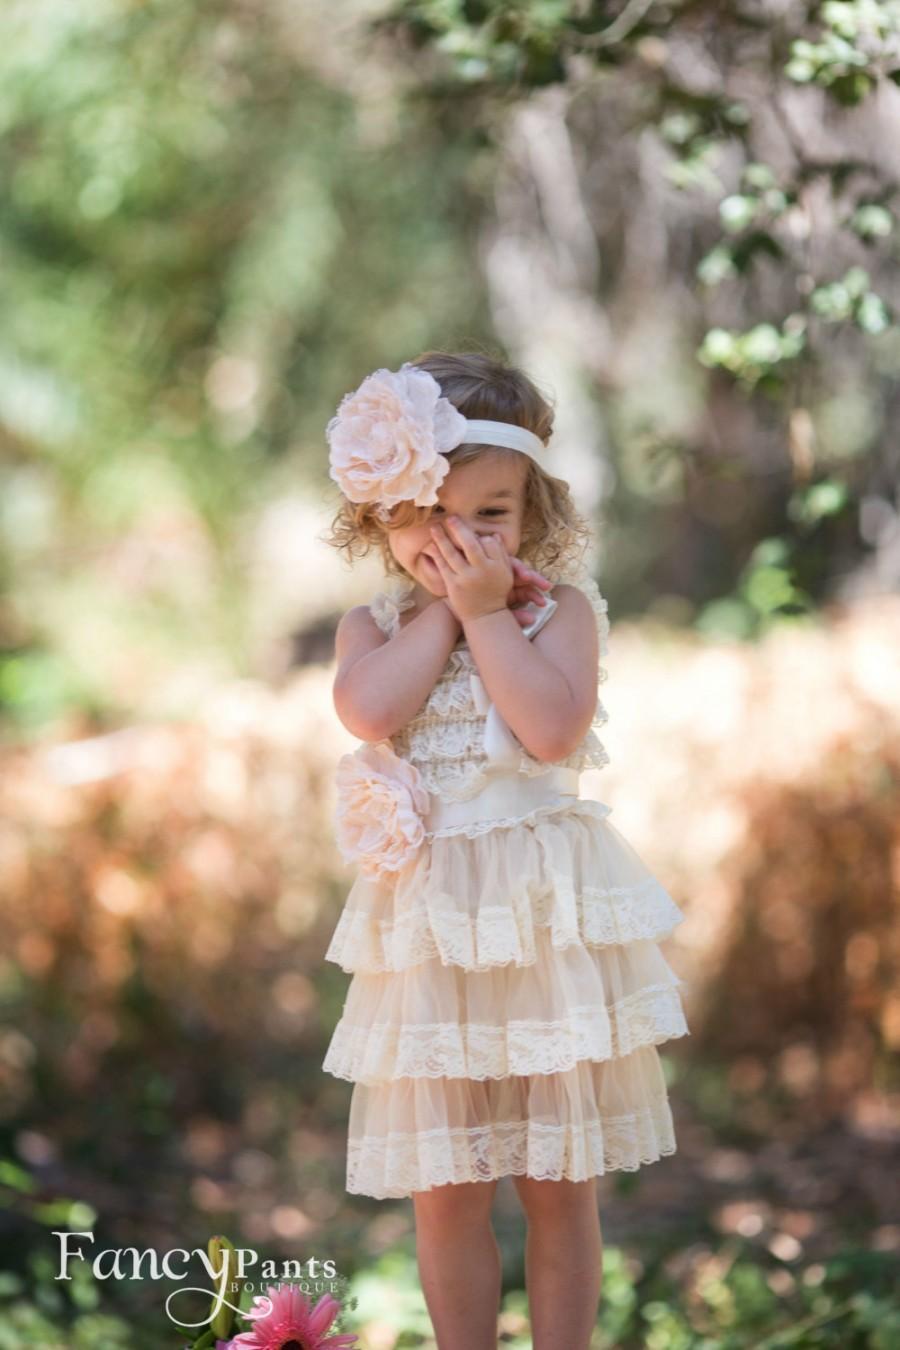 زفاف - Rustic Flower Girl Dress, Champagne Cream Flower Girl Dress, Toddler lace dress, Baby dress, Vintage / Shabby Chic dress, Birthday Dress